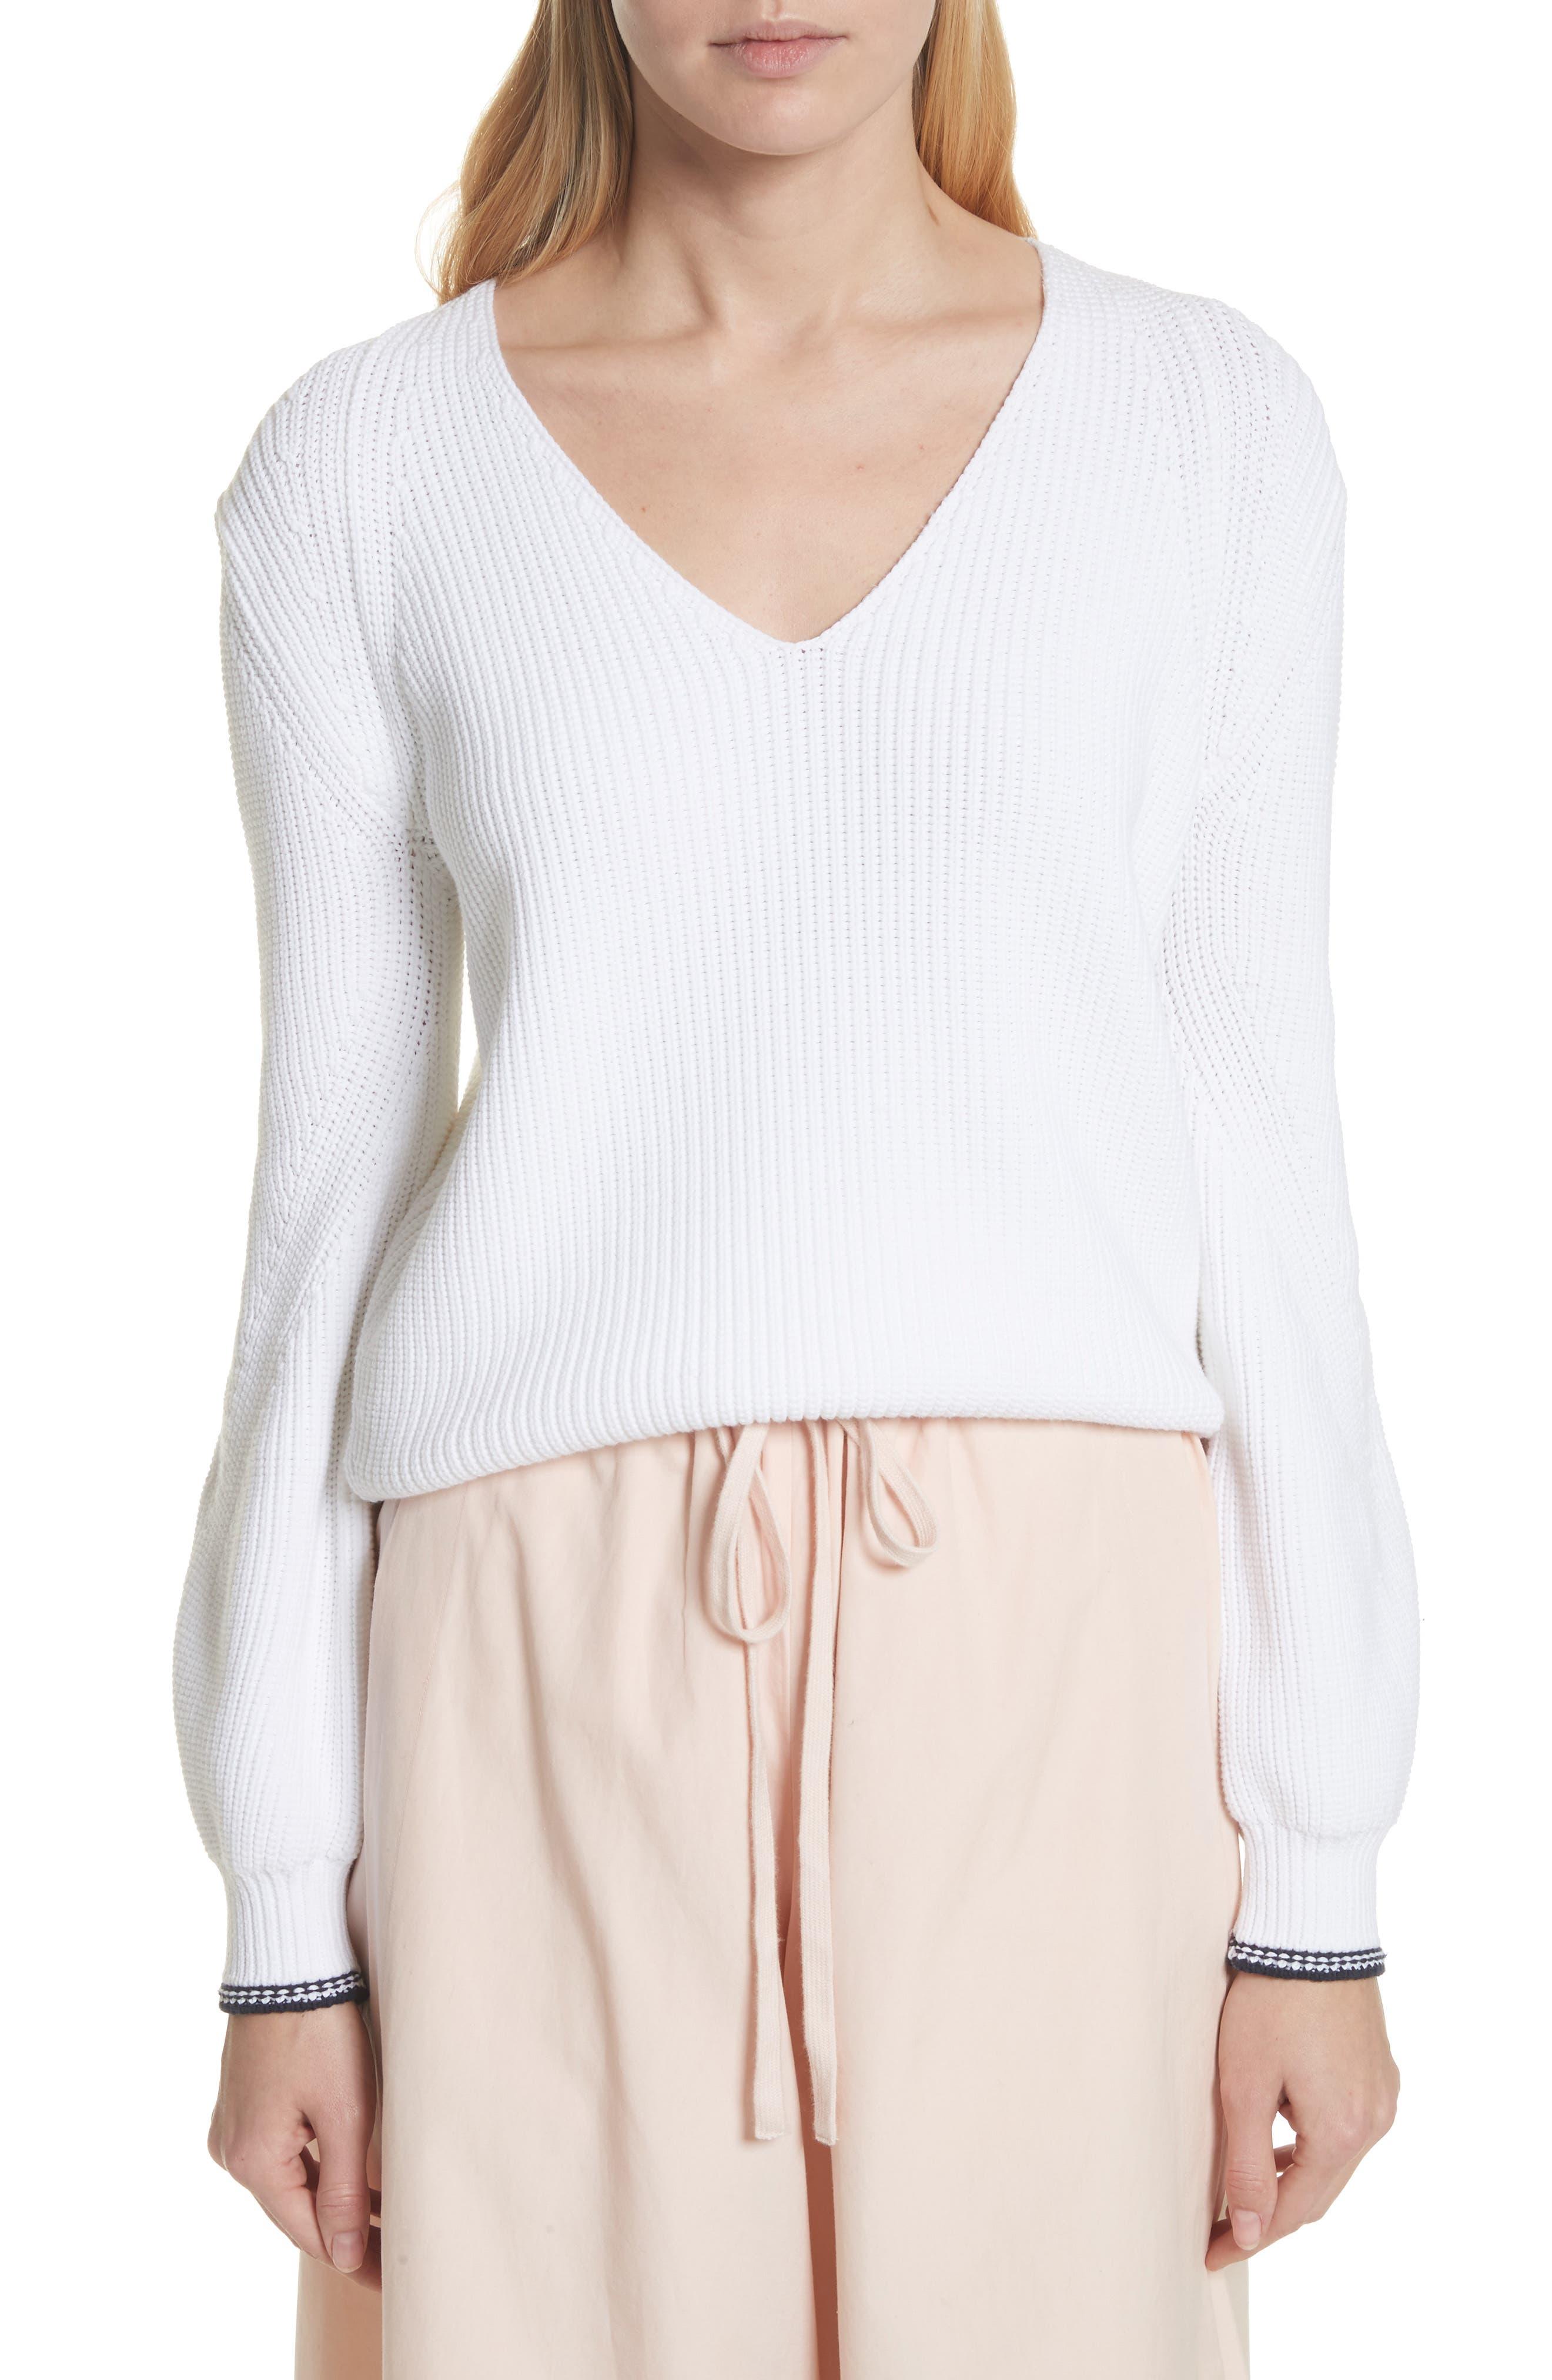 Bishop Sleeve Sweater,                             Main thumbnail 1, color,                             Optic White/ Coastal